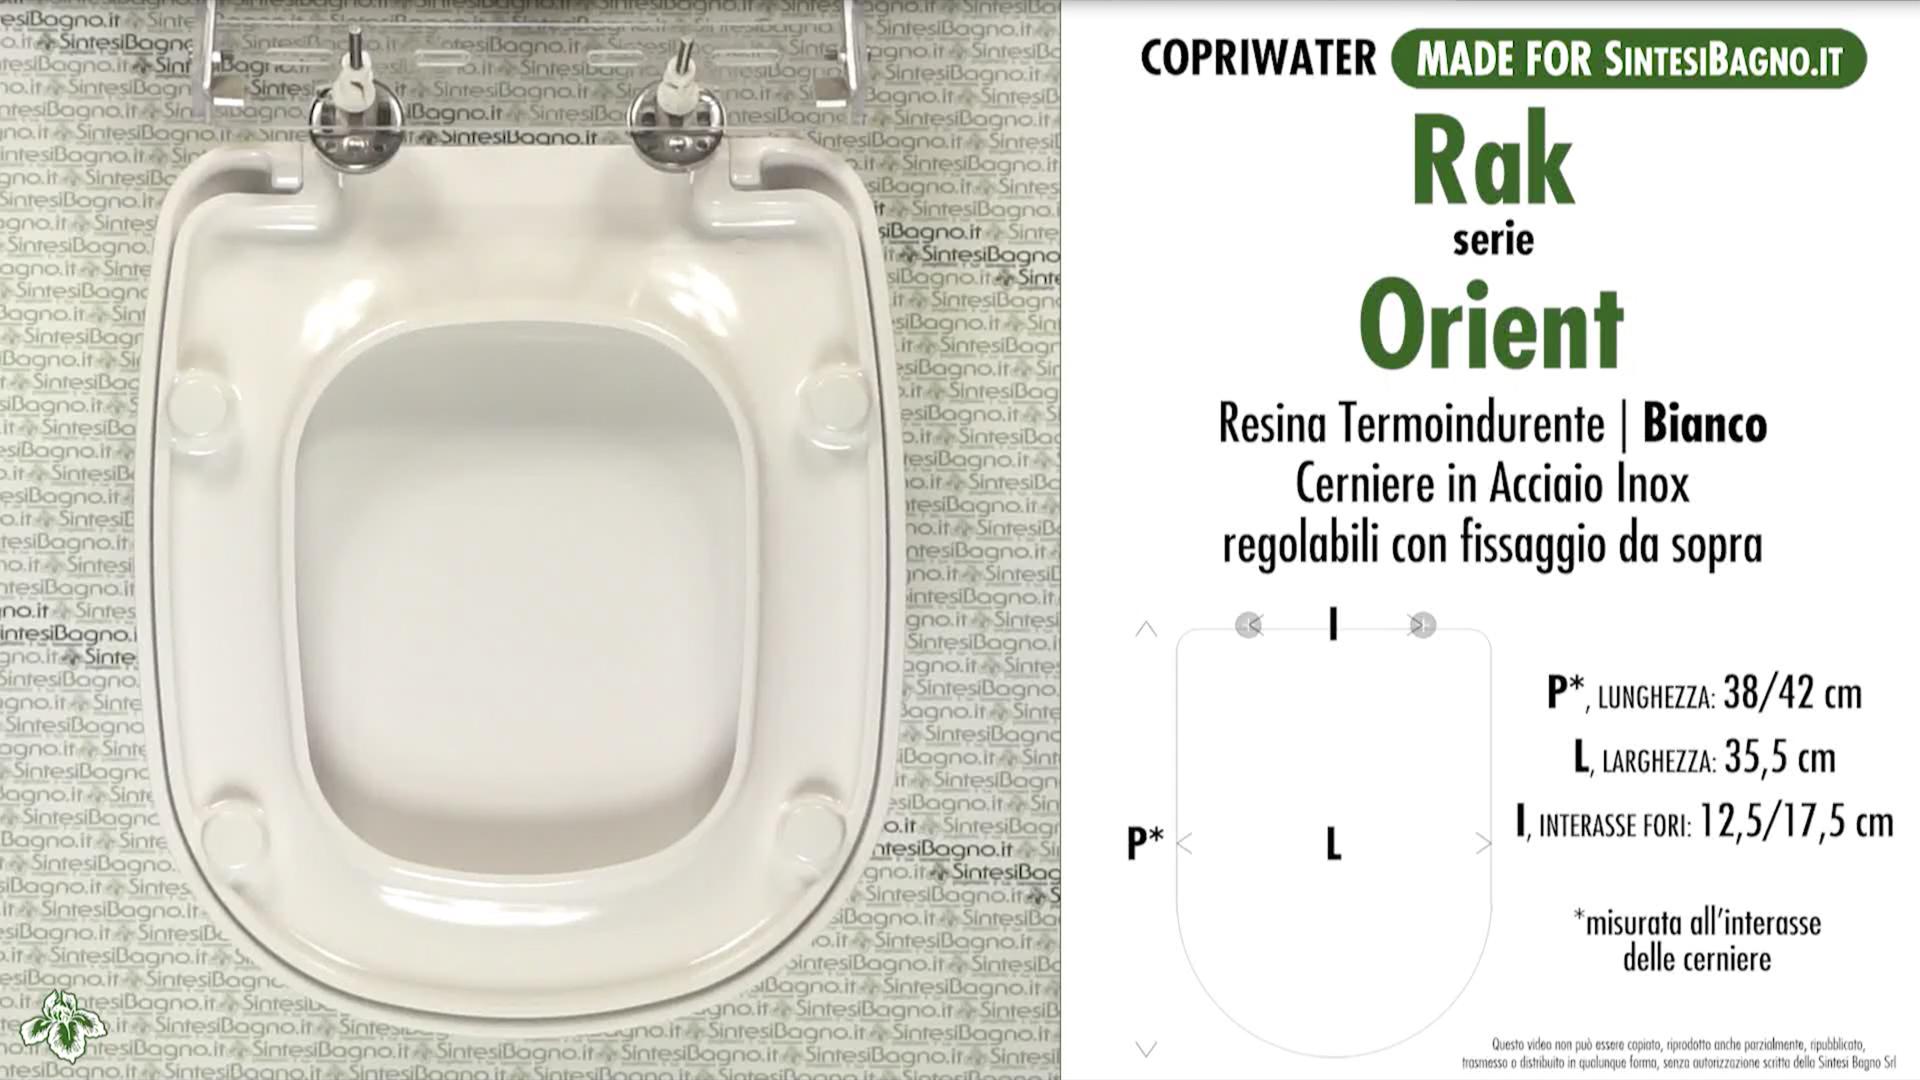 SCHEDA TECNICA MISURE copriwater RAK ORIENT